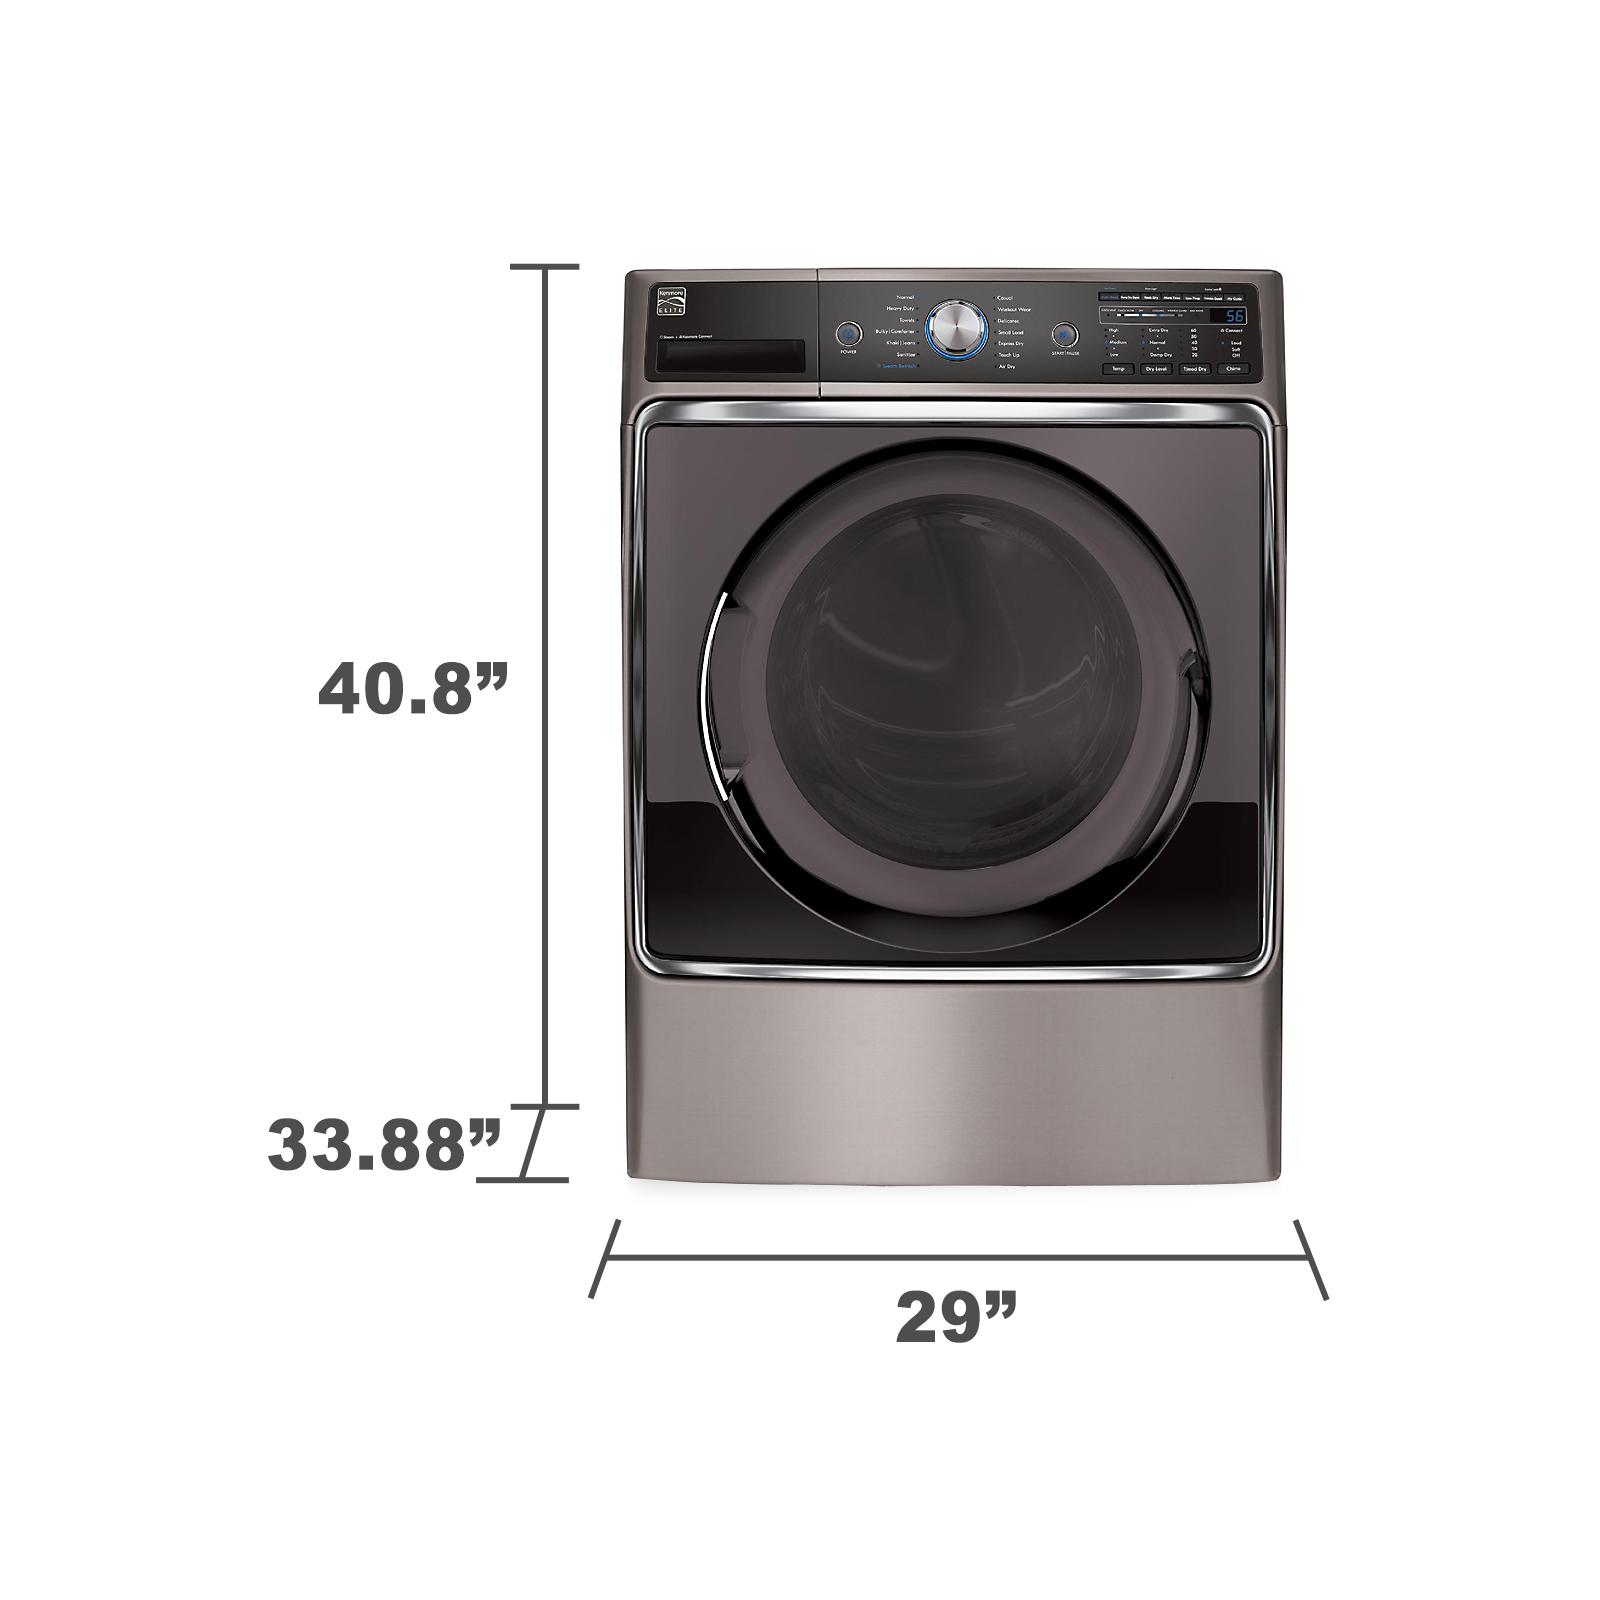 Kenmore Elite 81073 9.0 cu. ft. Electric Dryer - Metallic Silver